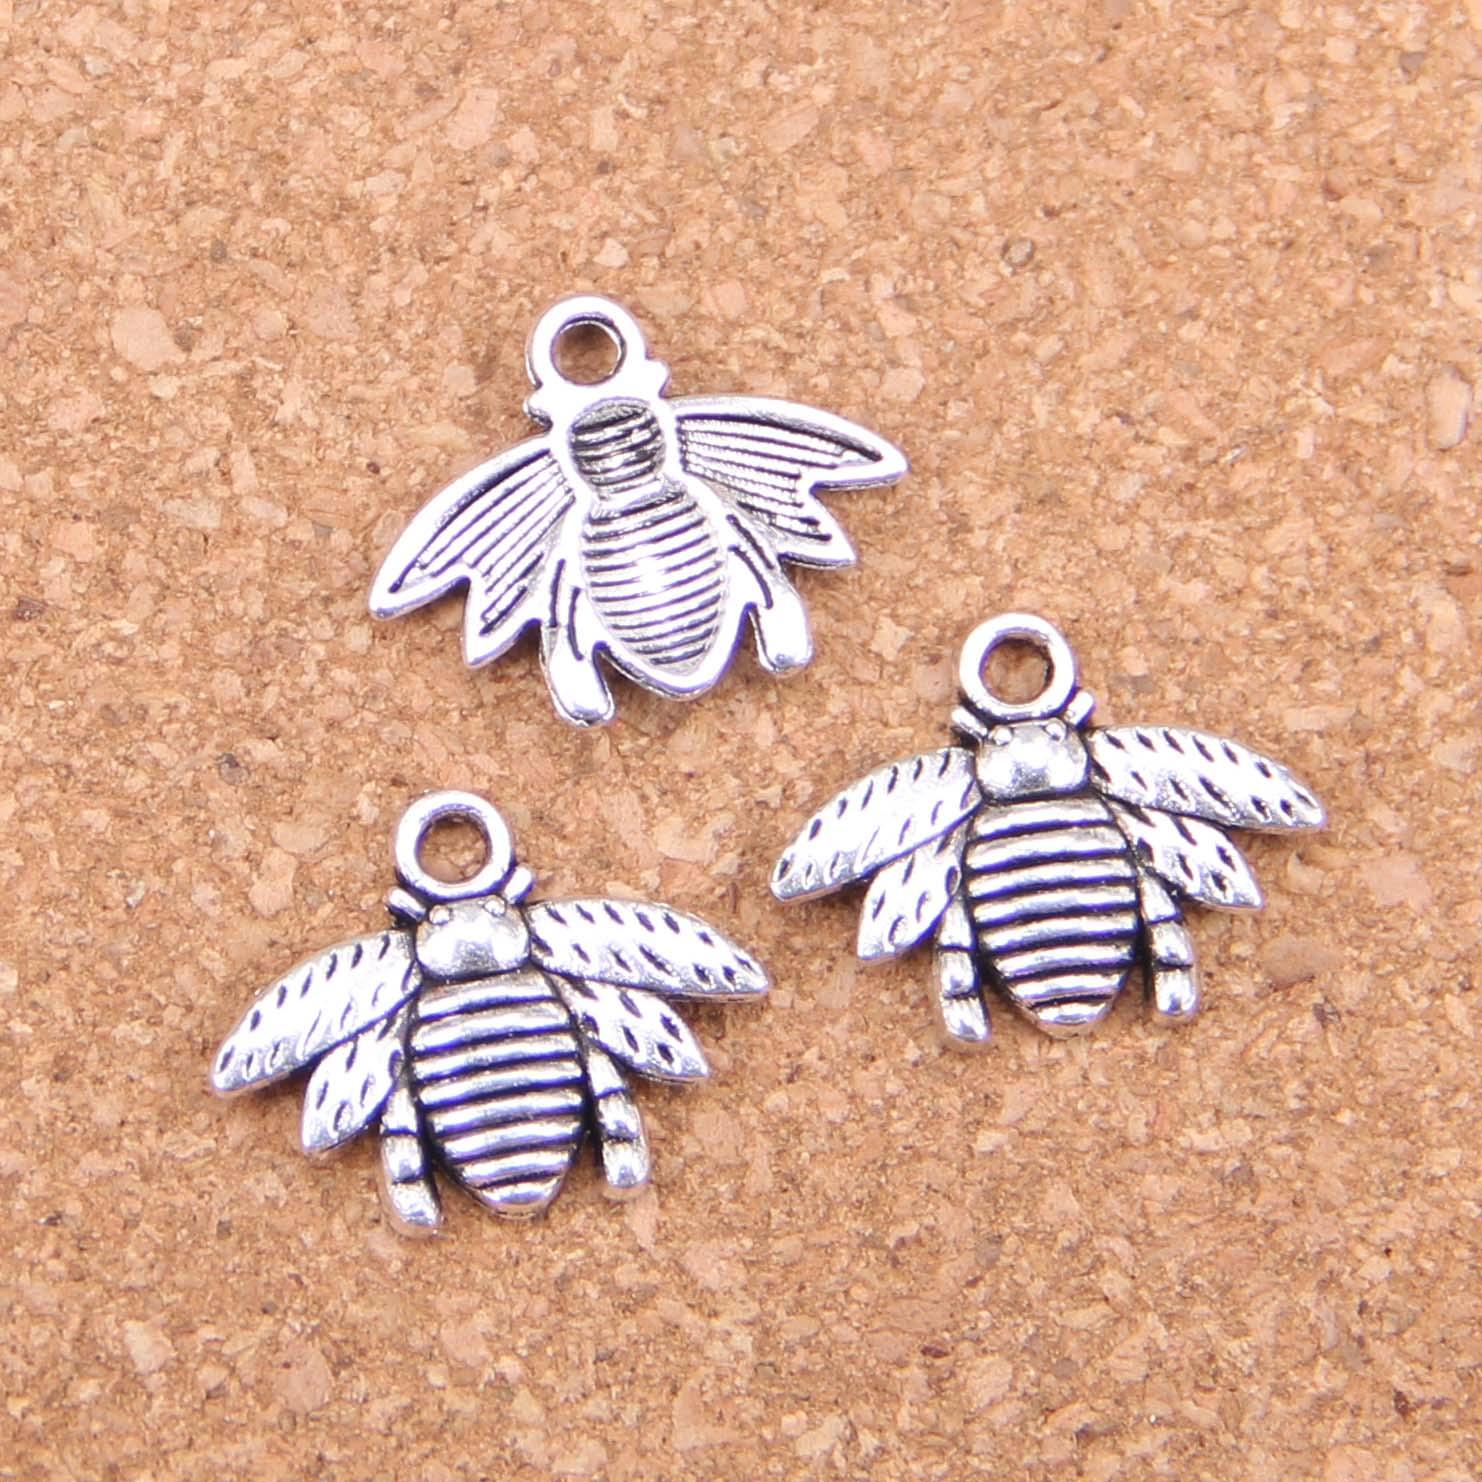 20pcs Charms bumblebee honey bee 21x16mm Antique Pendants,Vintage Tibetan Silver Jewelry,DIY for bracelet necklace